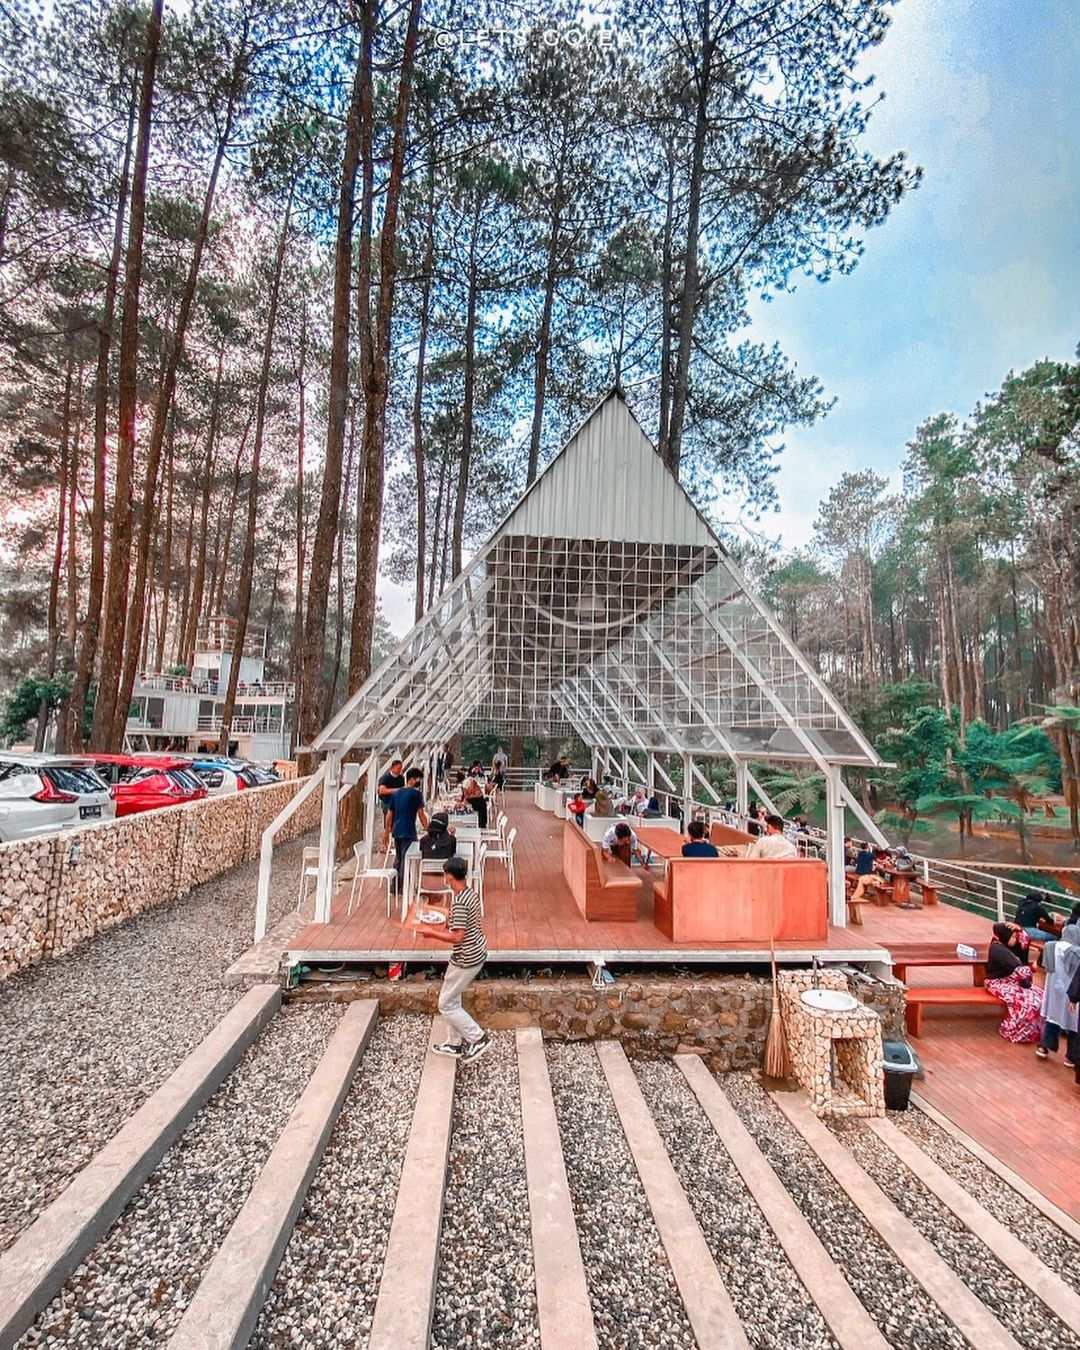 Suasana Di Warung Kopi Gunung Cikole Bandung Image From @warungkopigunung